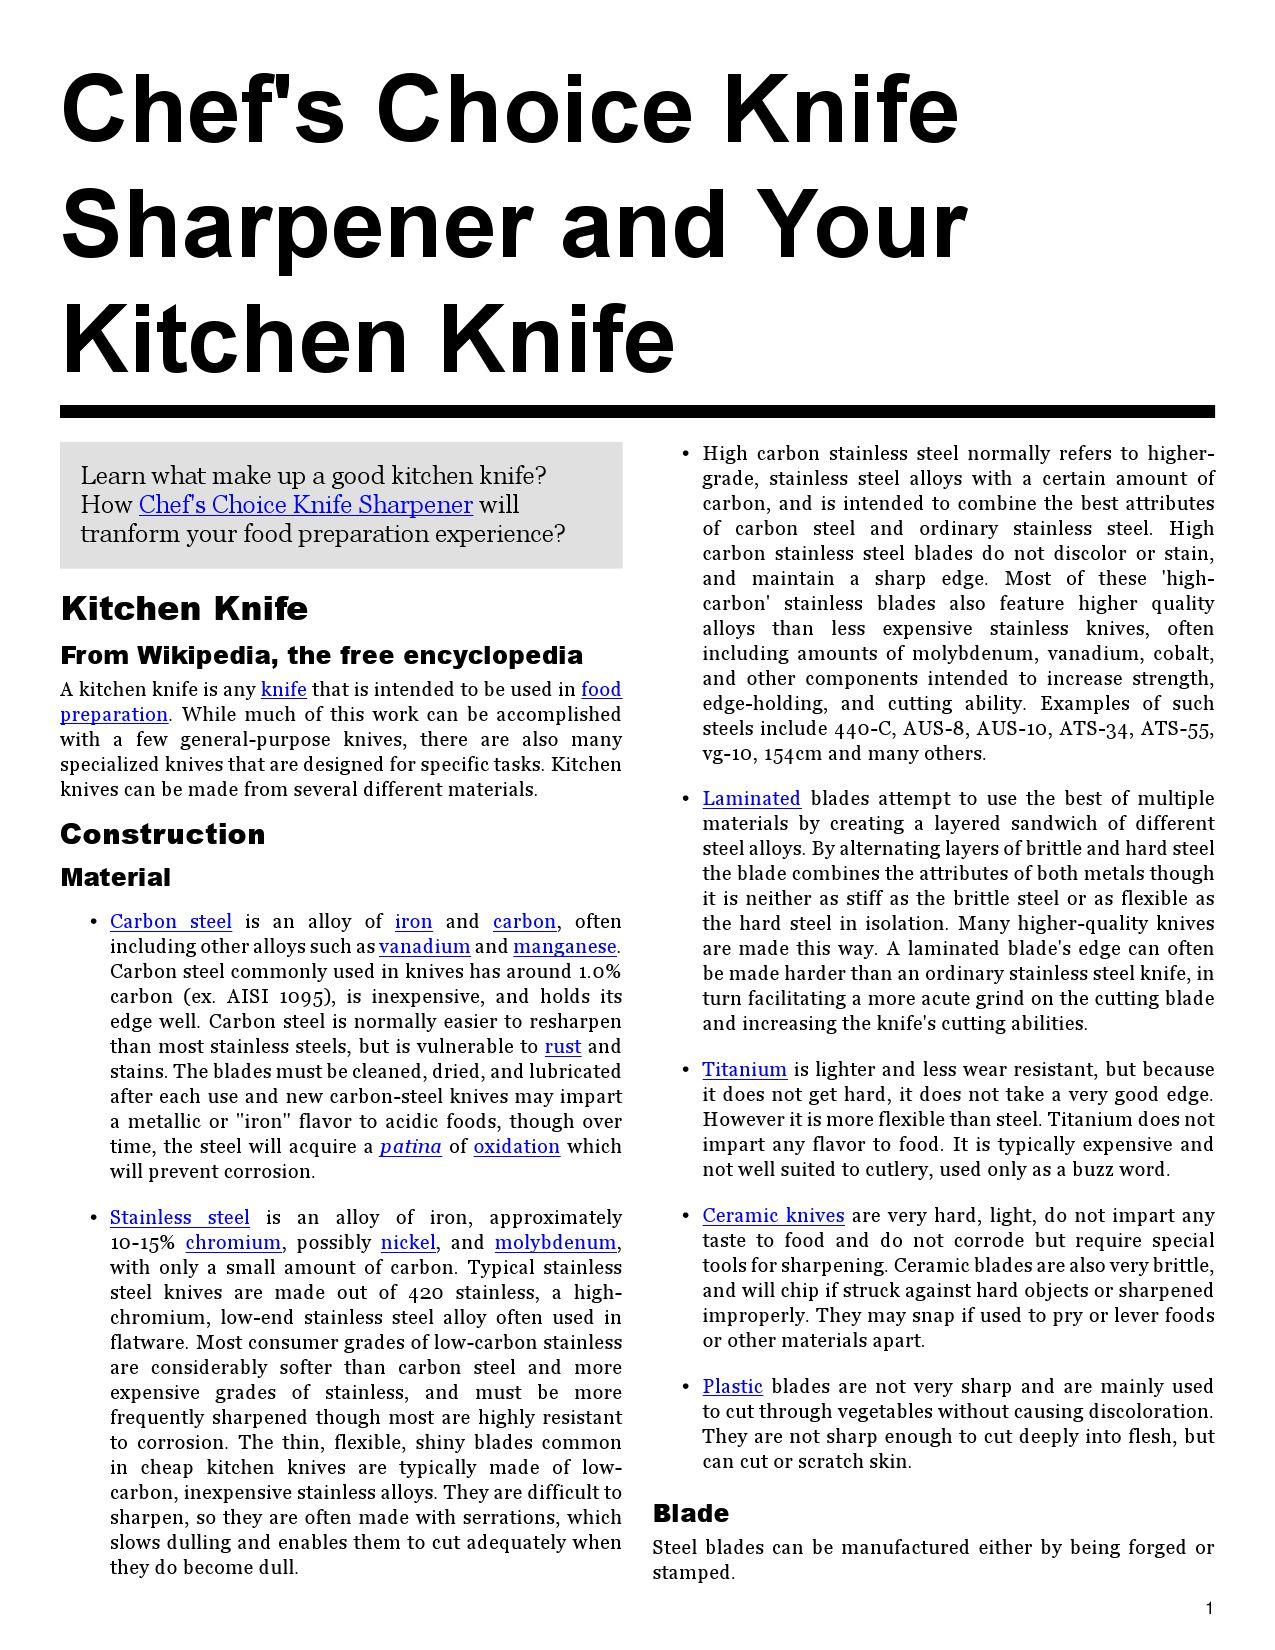 chef u0027s choice knife sharpener secret u0026 kitchen knife exposed by